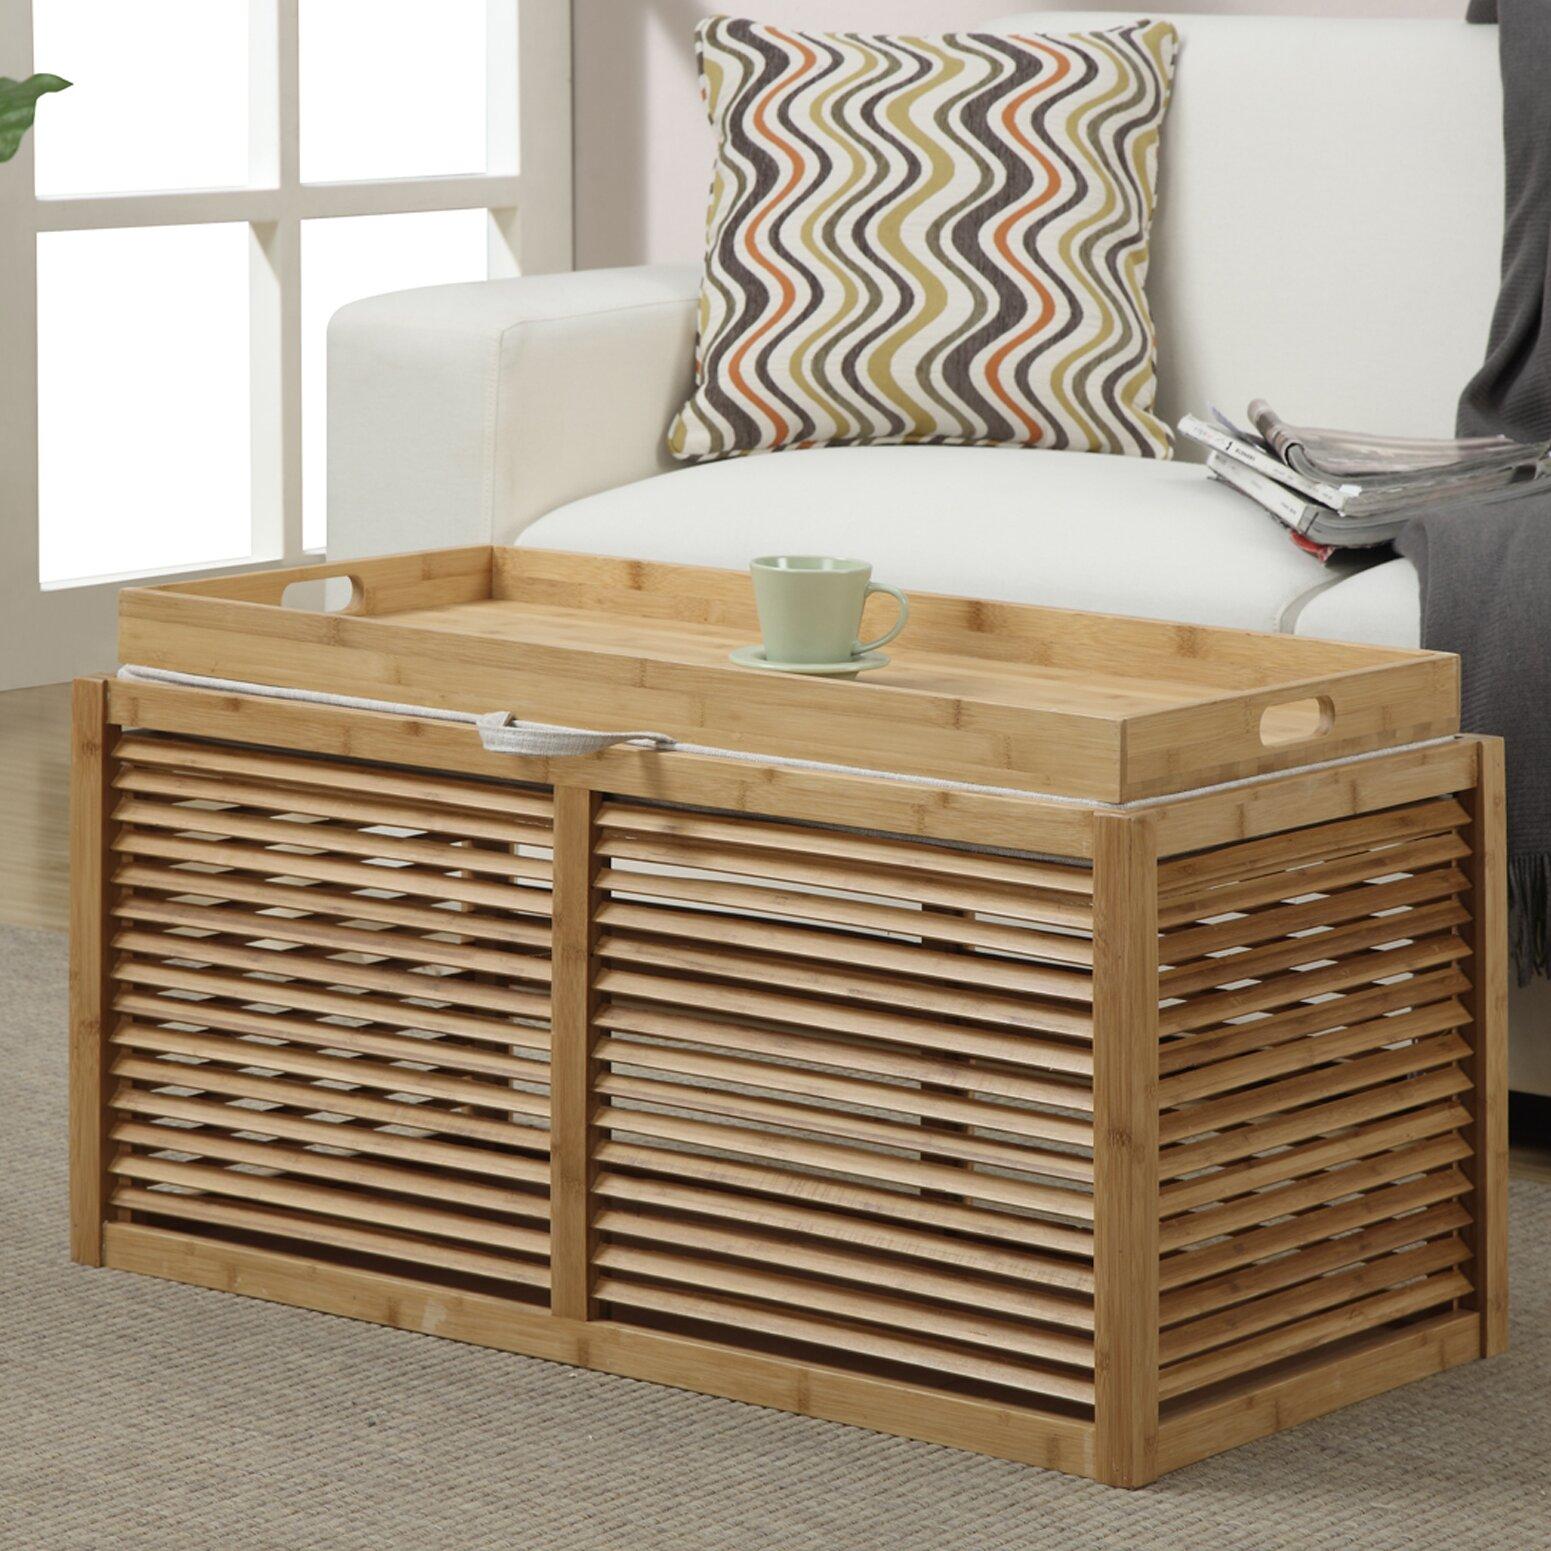 Wyland Double Storage Ottoman - Beachcrest Home™ Wyland Double Storage Ottoman & Reviews Wayfair